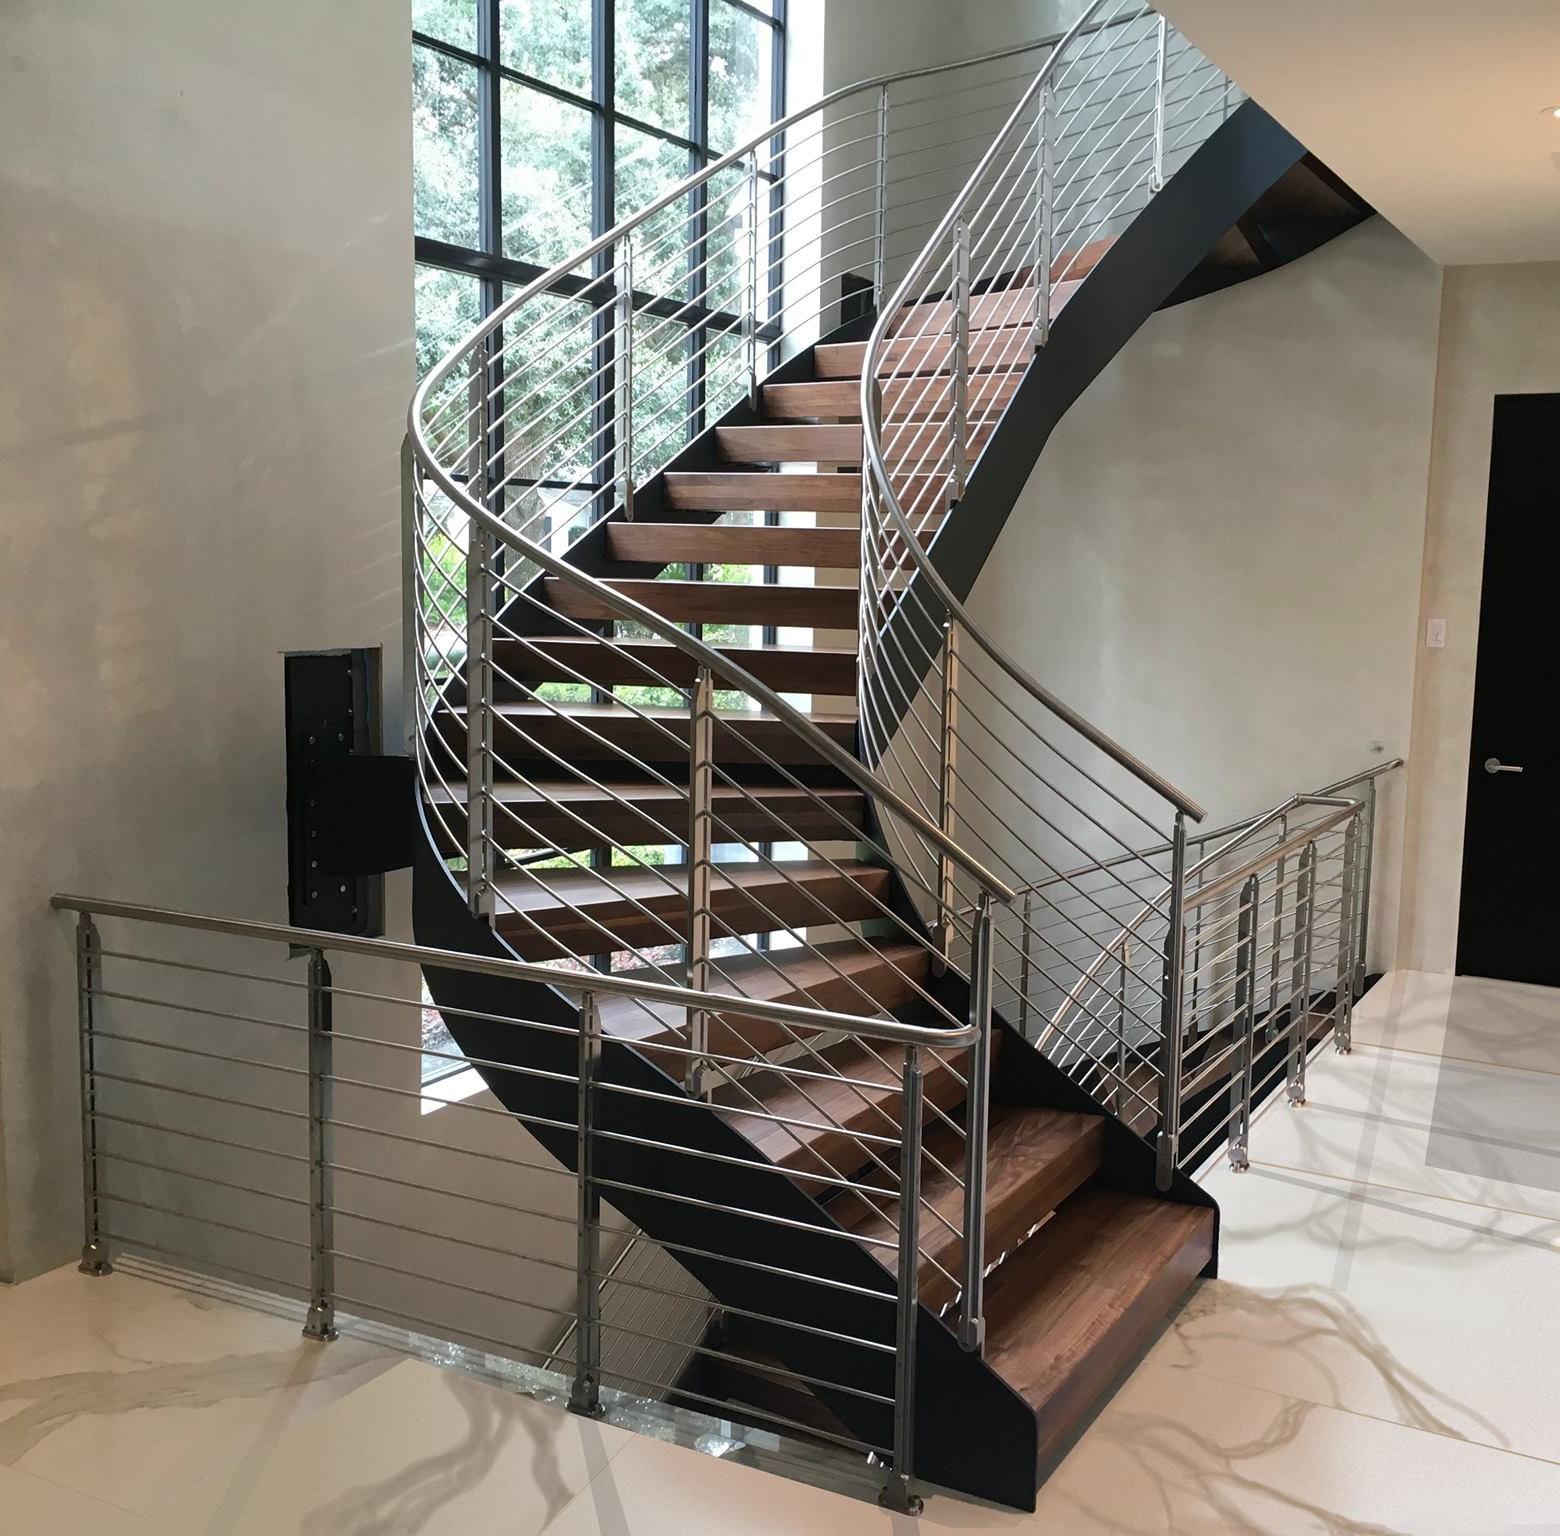 China Modern Staircase Design Wood Steel Curved Staircase   Round Staircase Designs Interior   Classic   Wooden   Elegant   Showroom   Round Shape Round